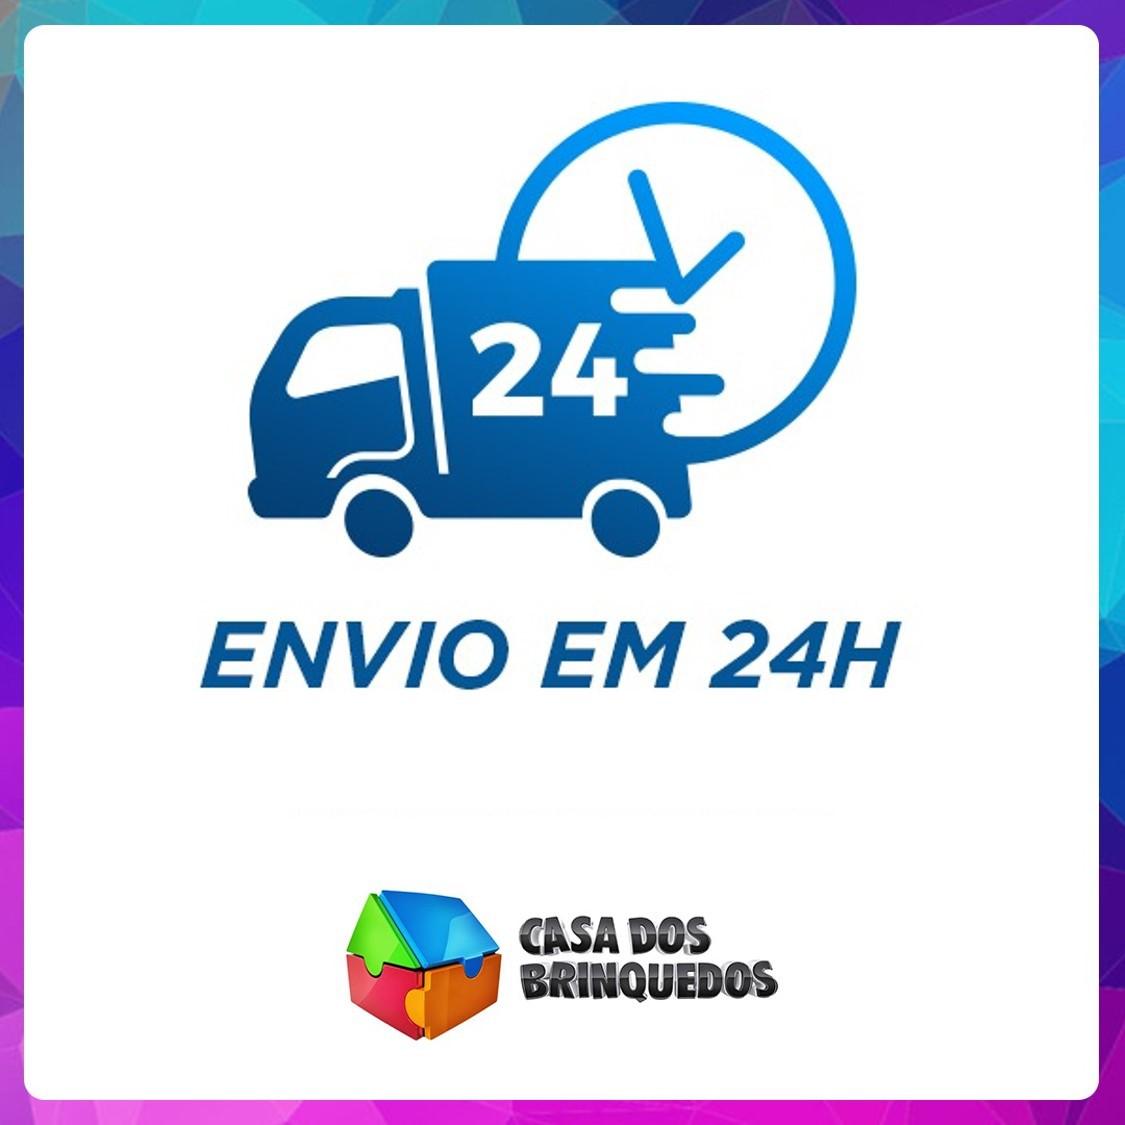 BONECO MARVEL THOR 24CM E7695 HASBRO